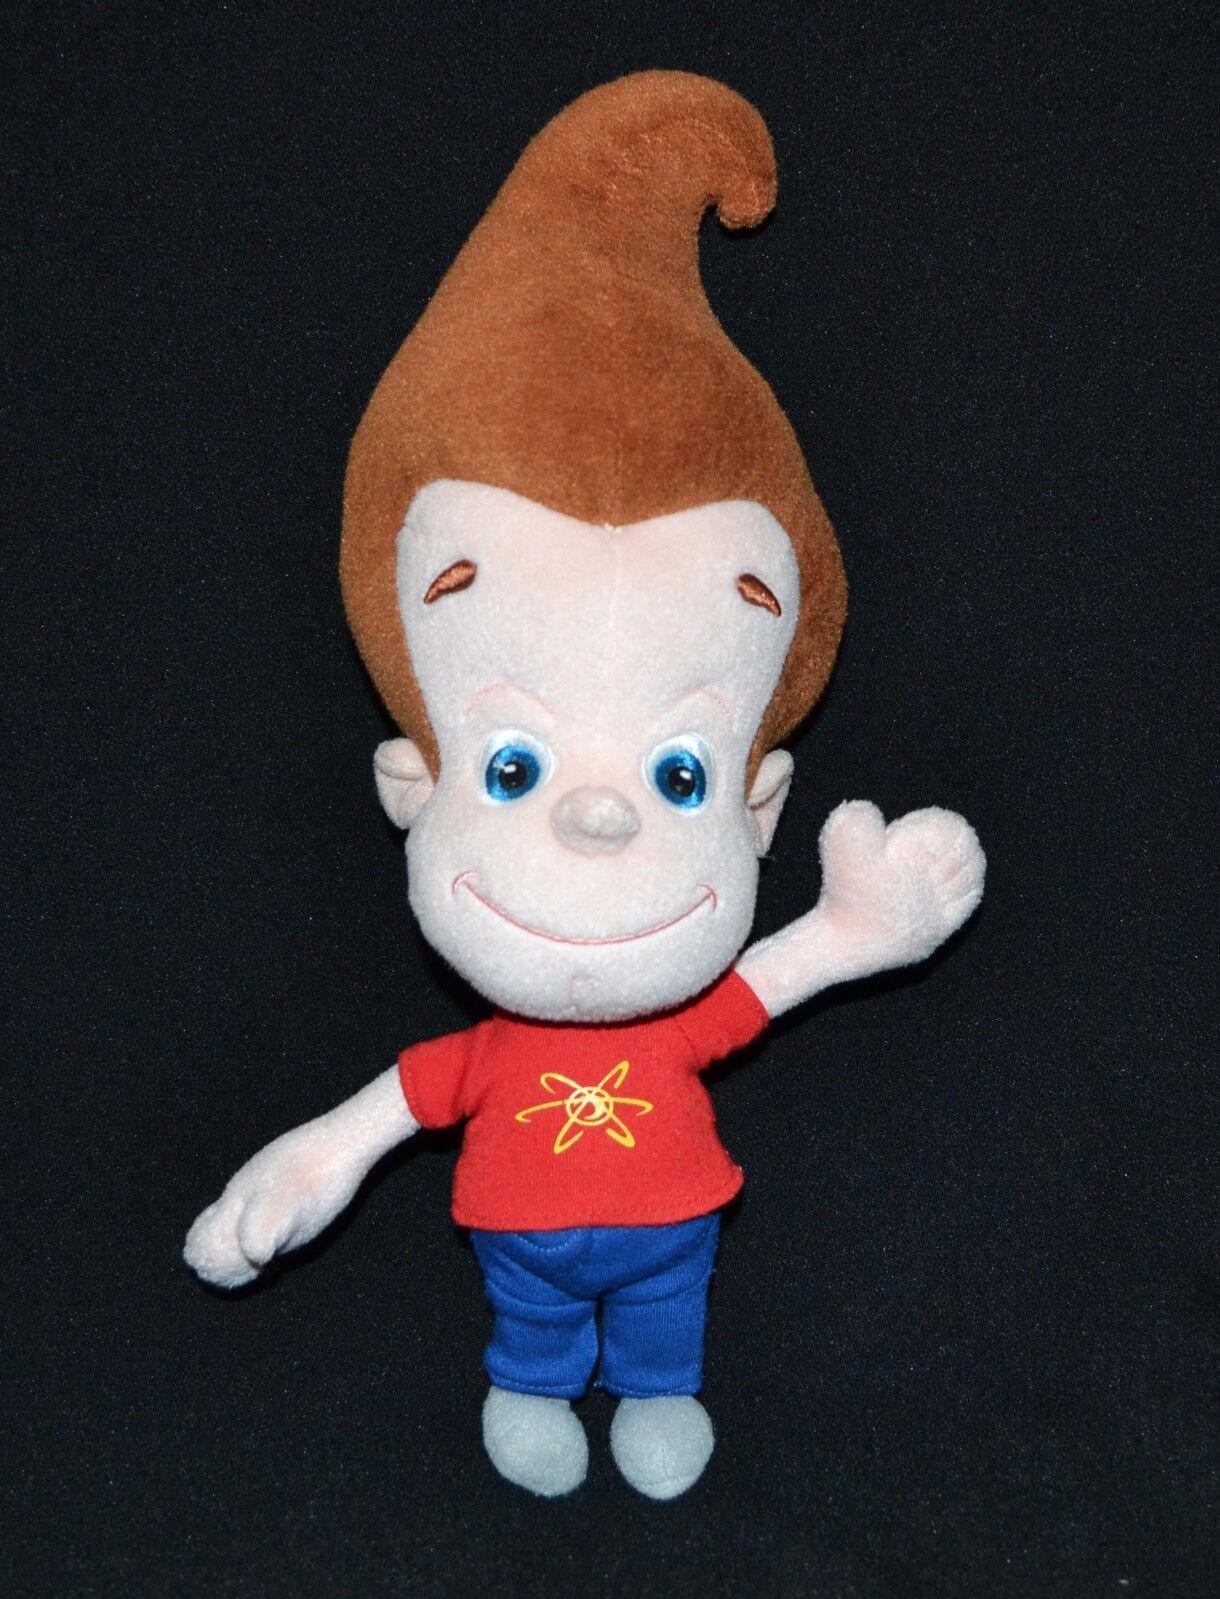 Jimmy Neutron Neutron Neutron Boy Genius Plush Dreamworld 35cm d3c327